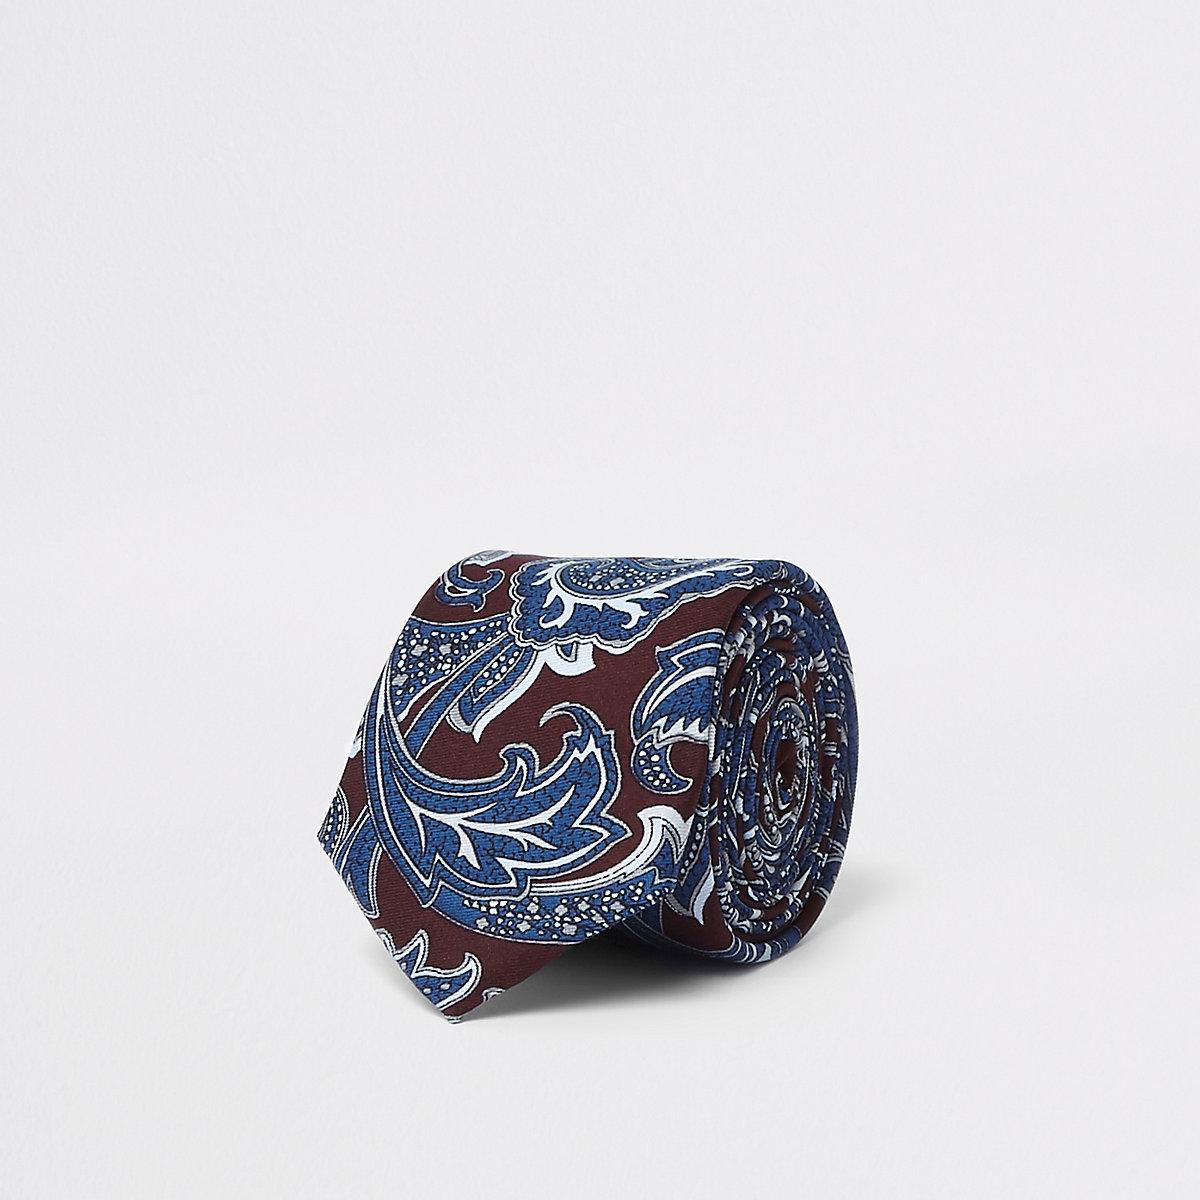 Krawatte mit Paisley-Print in Bordeaux und Marineblau